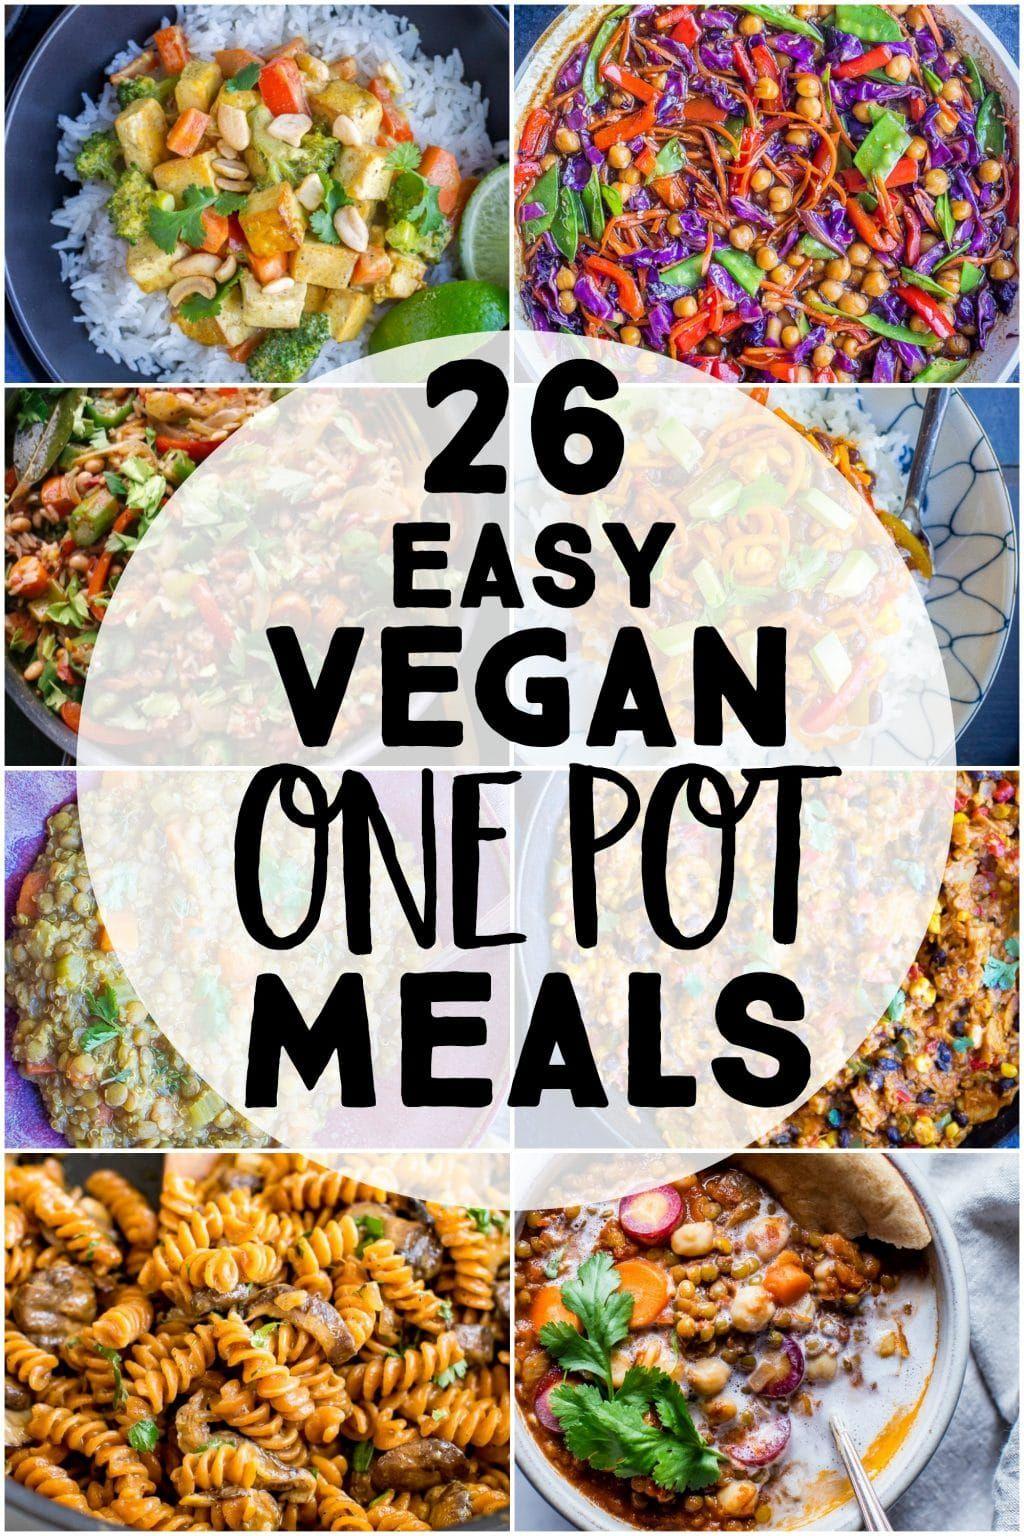 Easy Vegan One Pot Meals #easyonepotmeals